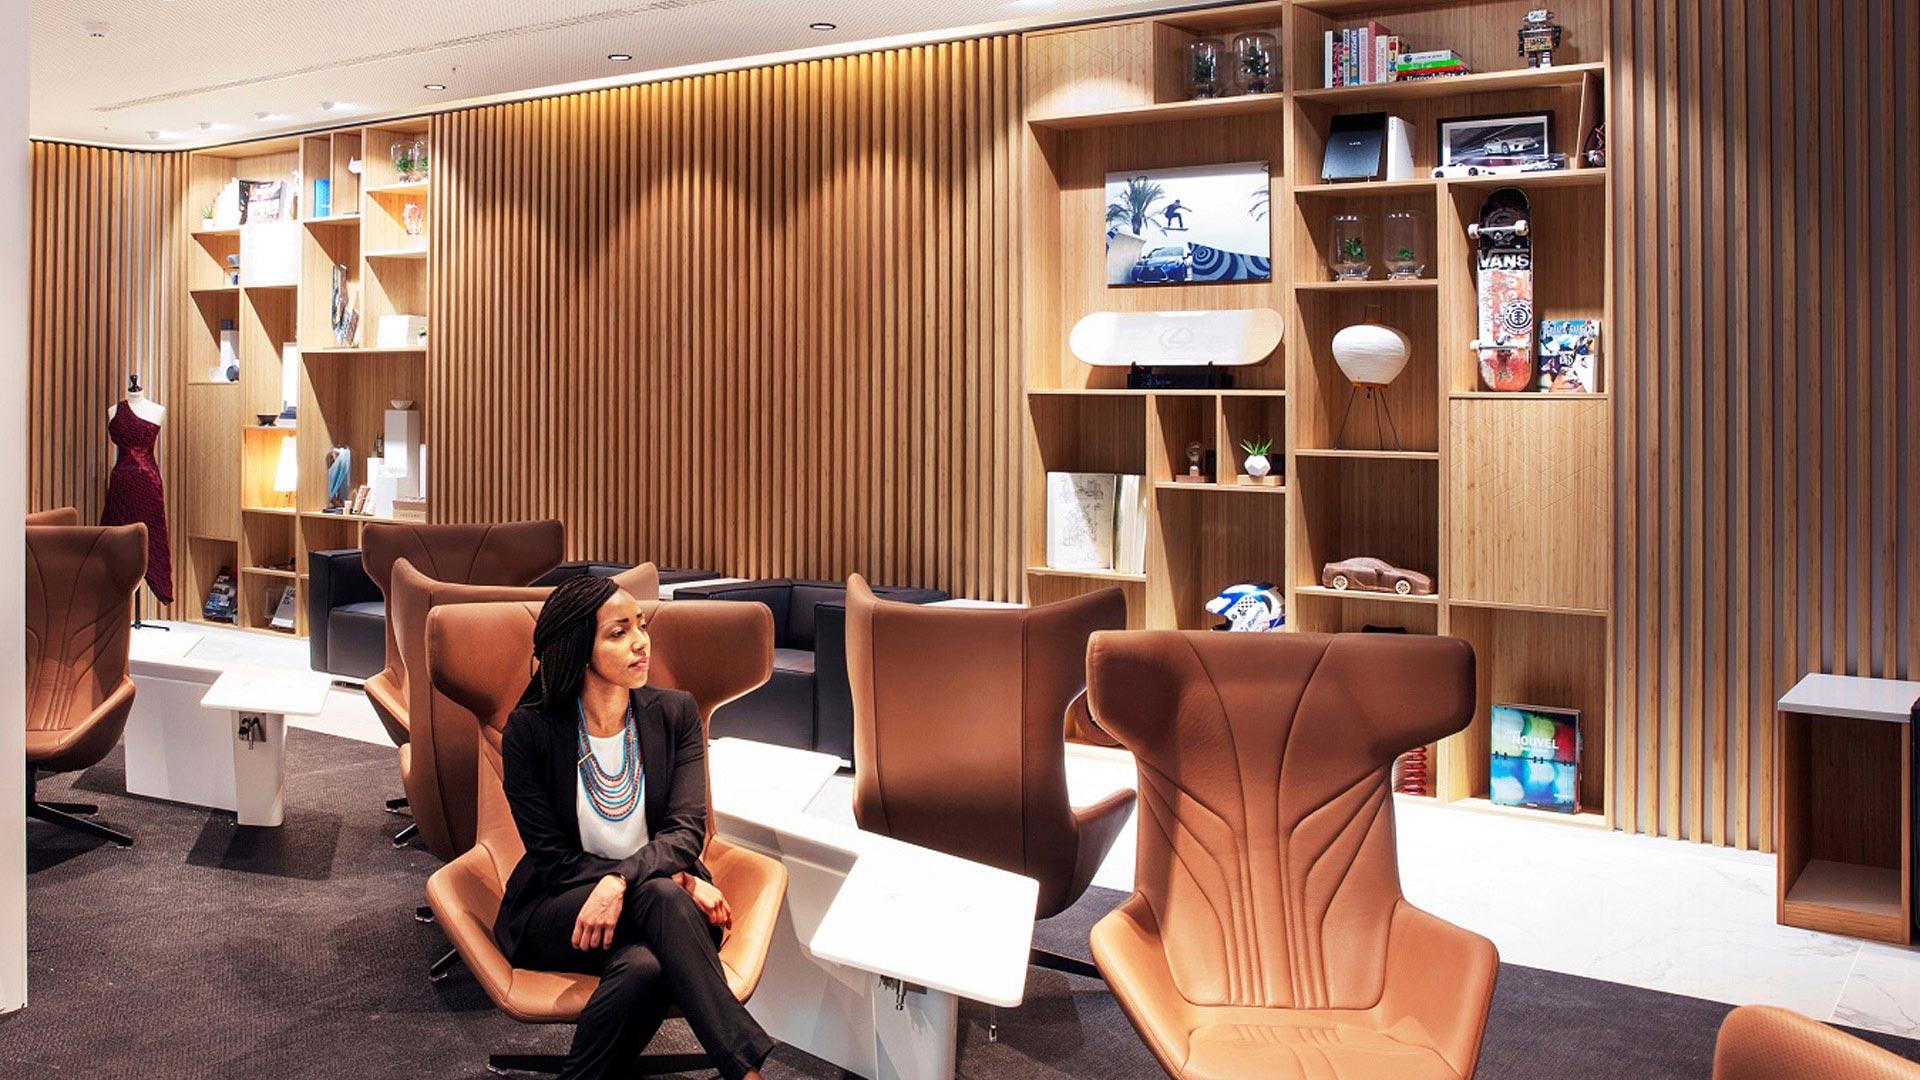 Lexus Lounge alani gallery02 v2